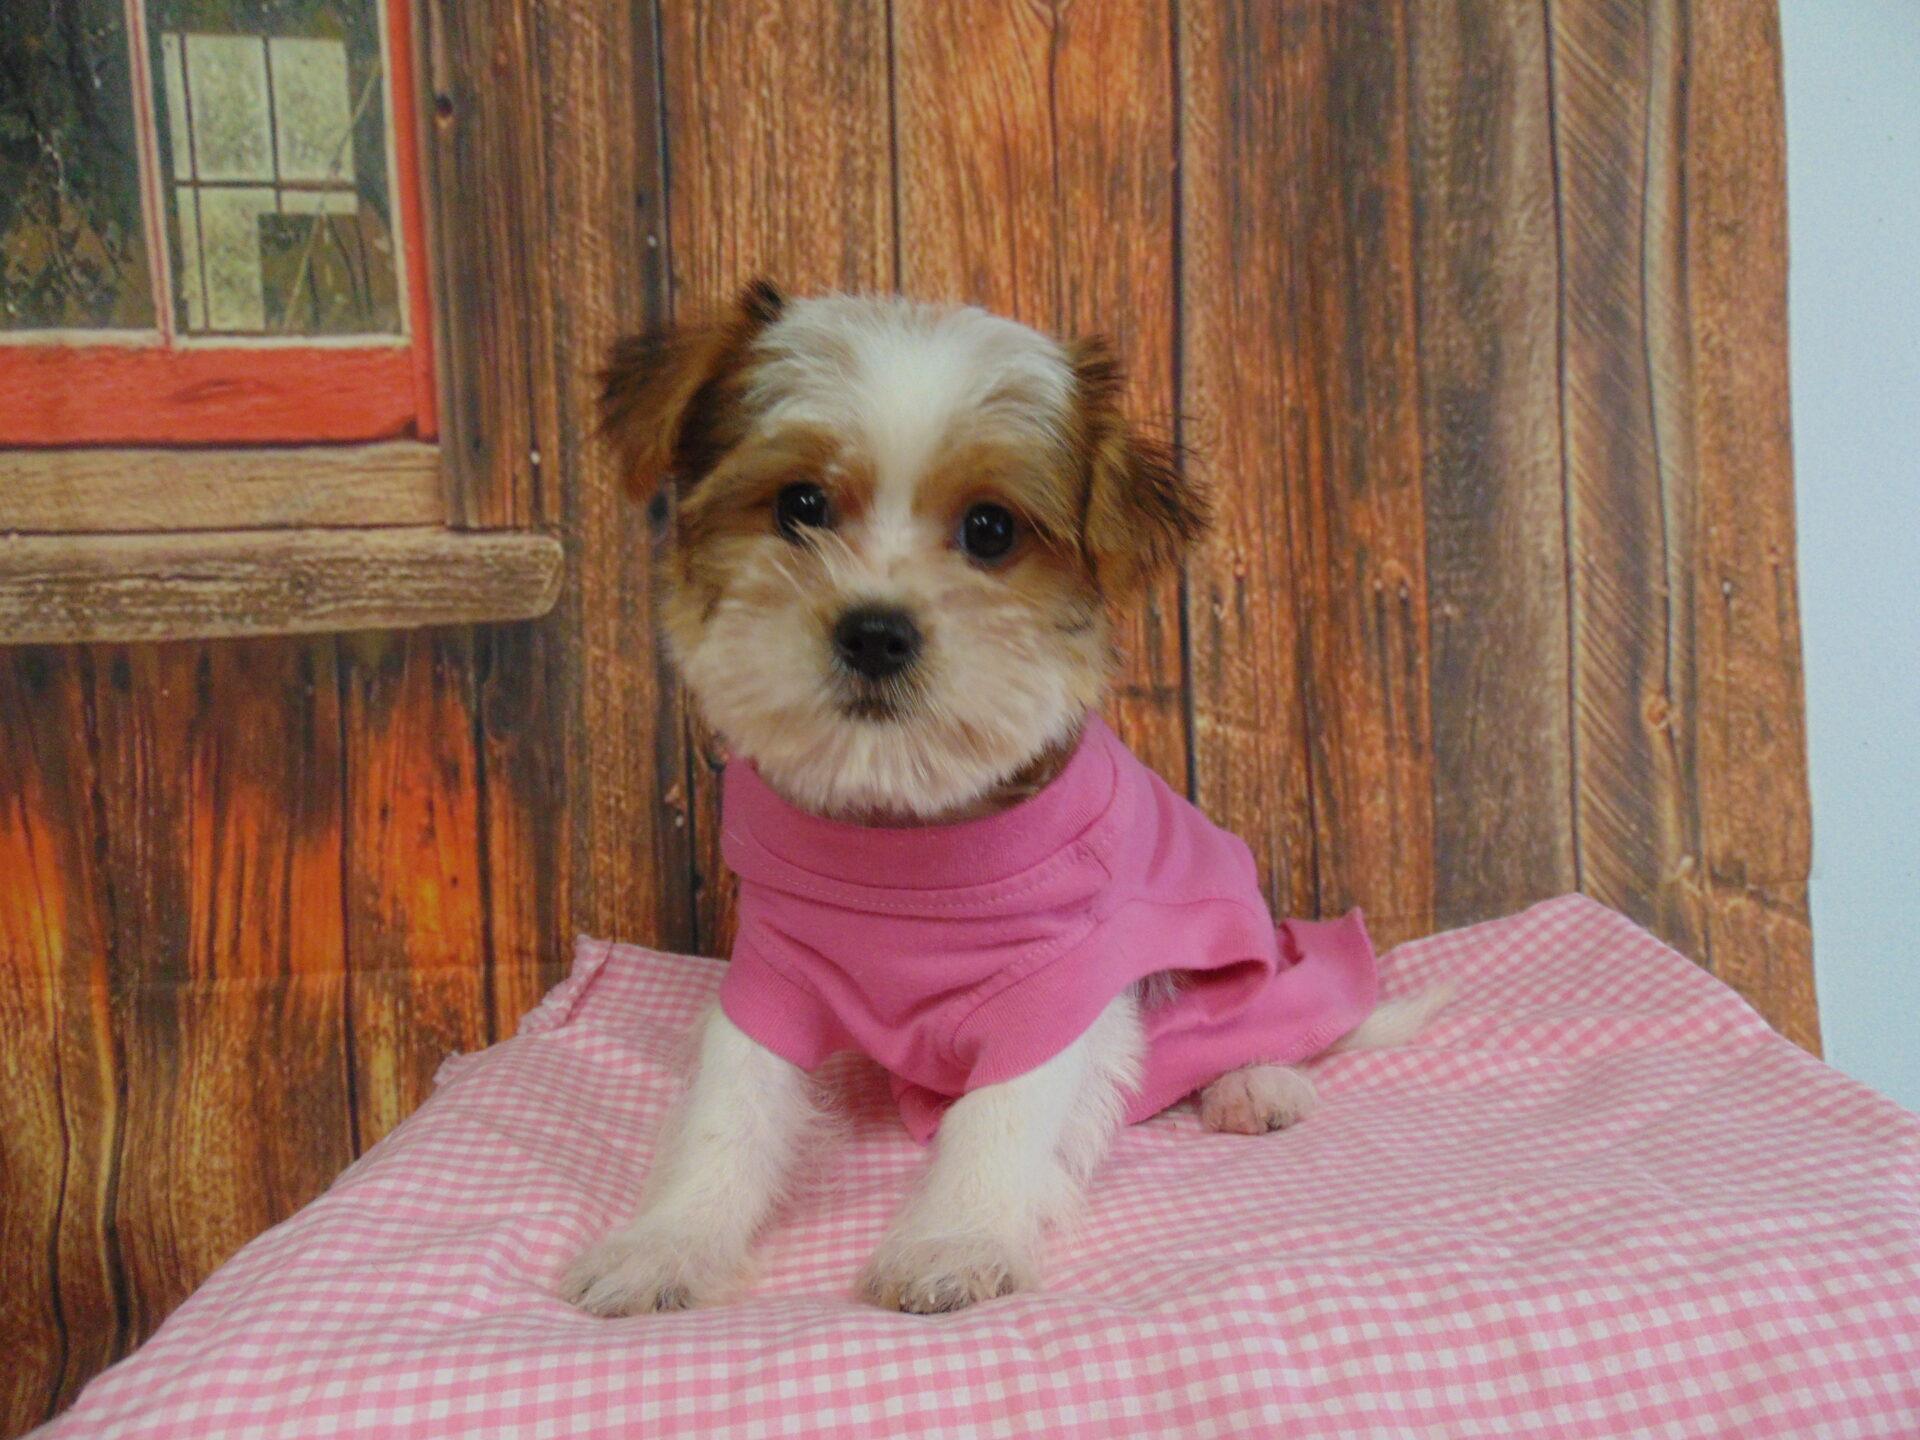 Pet Store Fredericksburg VA: Puppies & Dogs for Sale